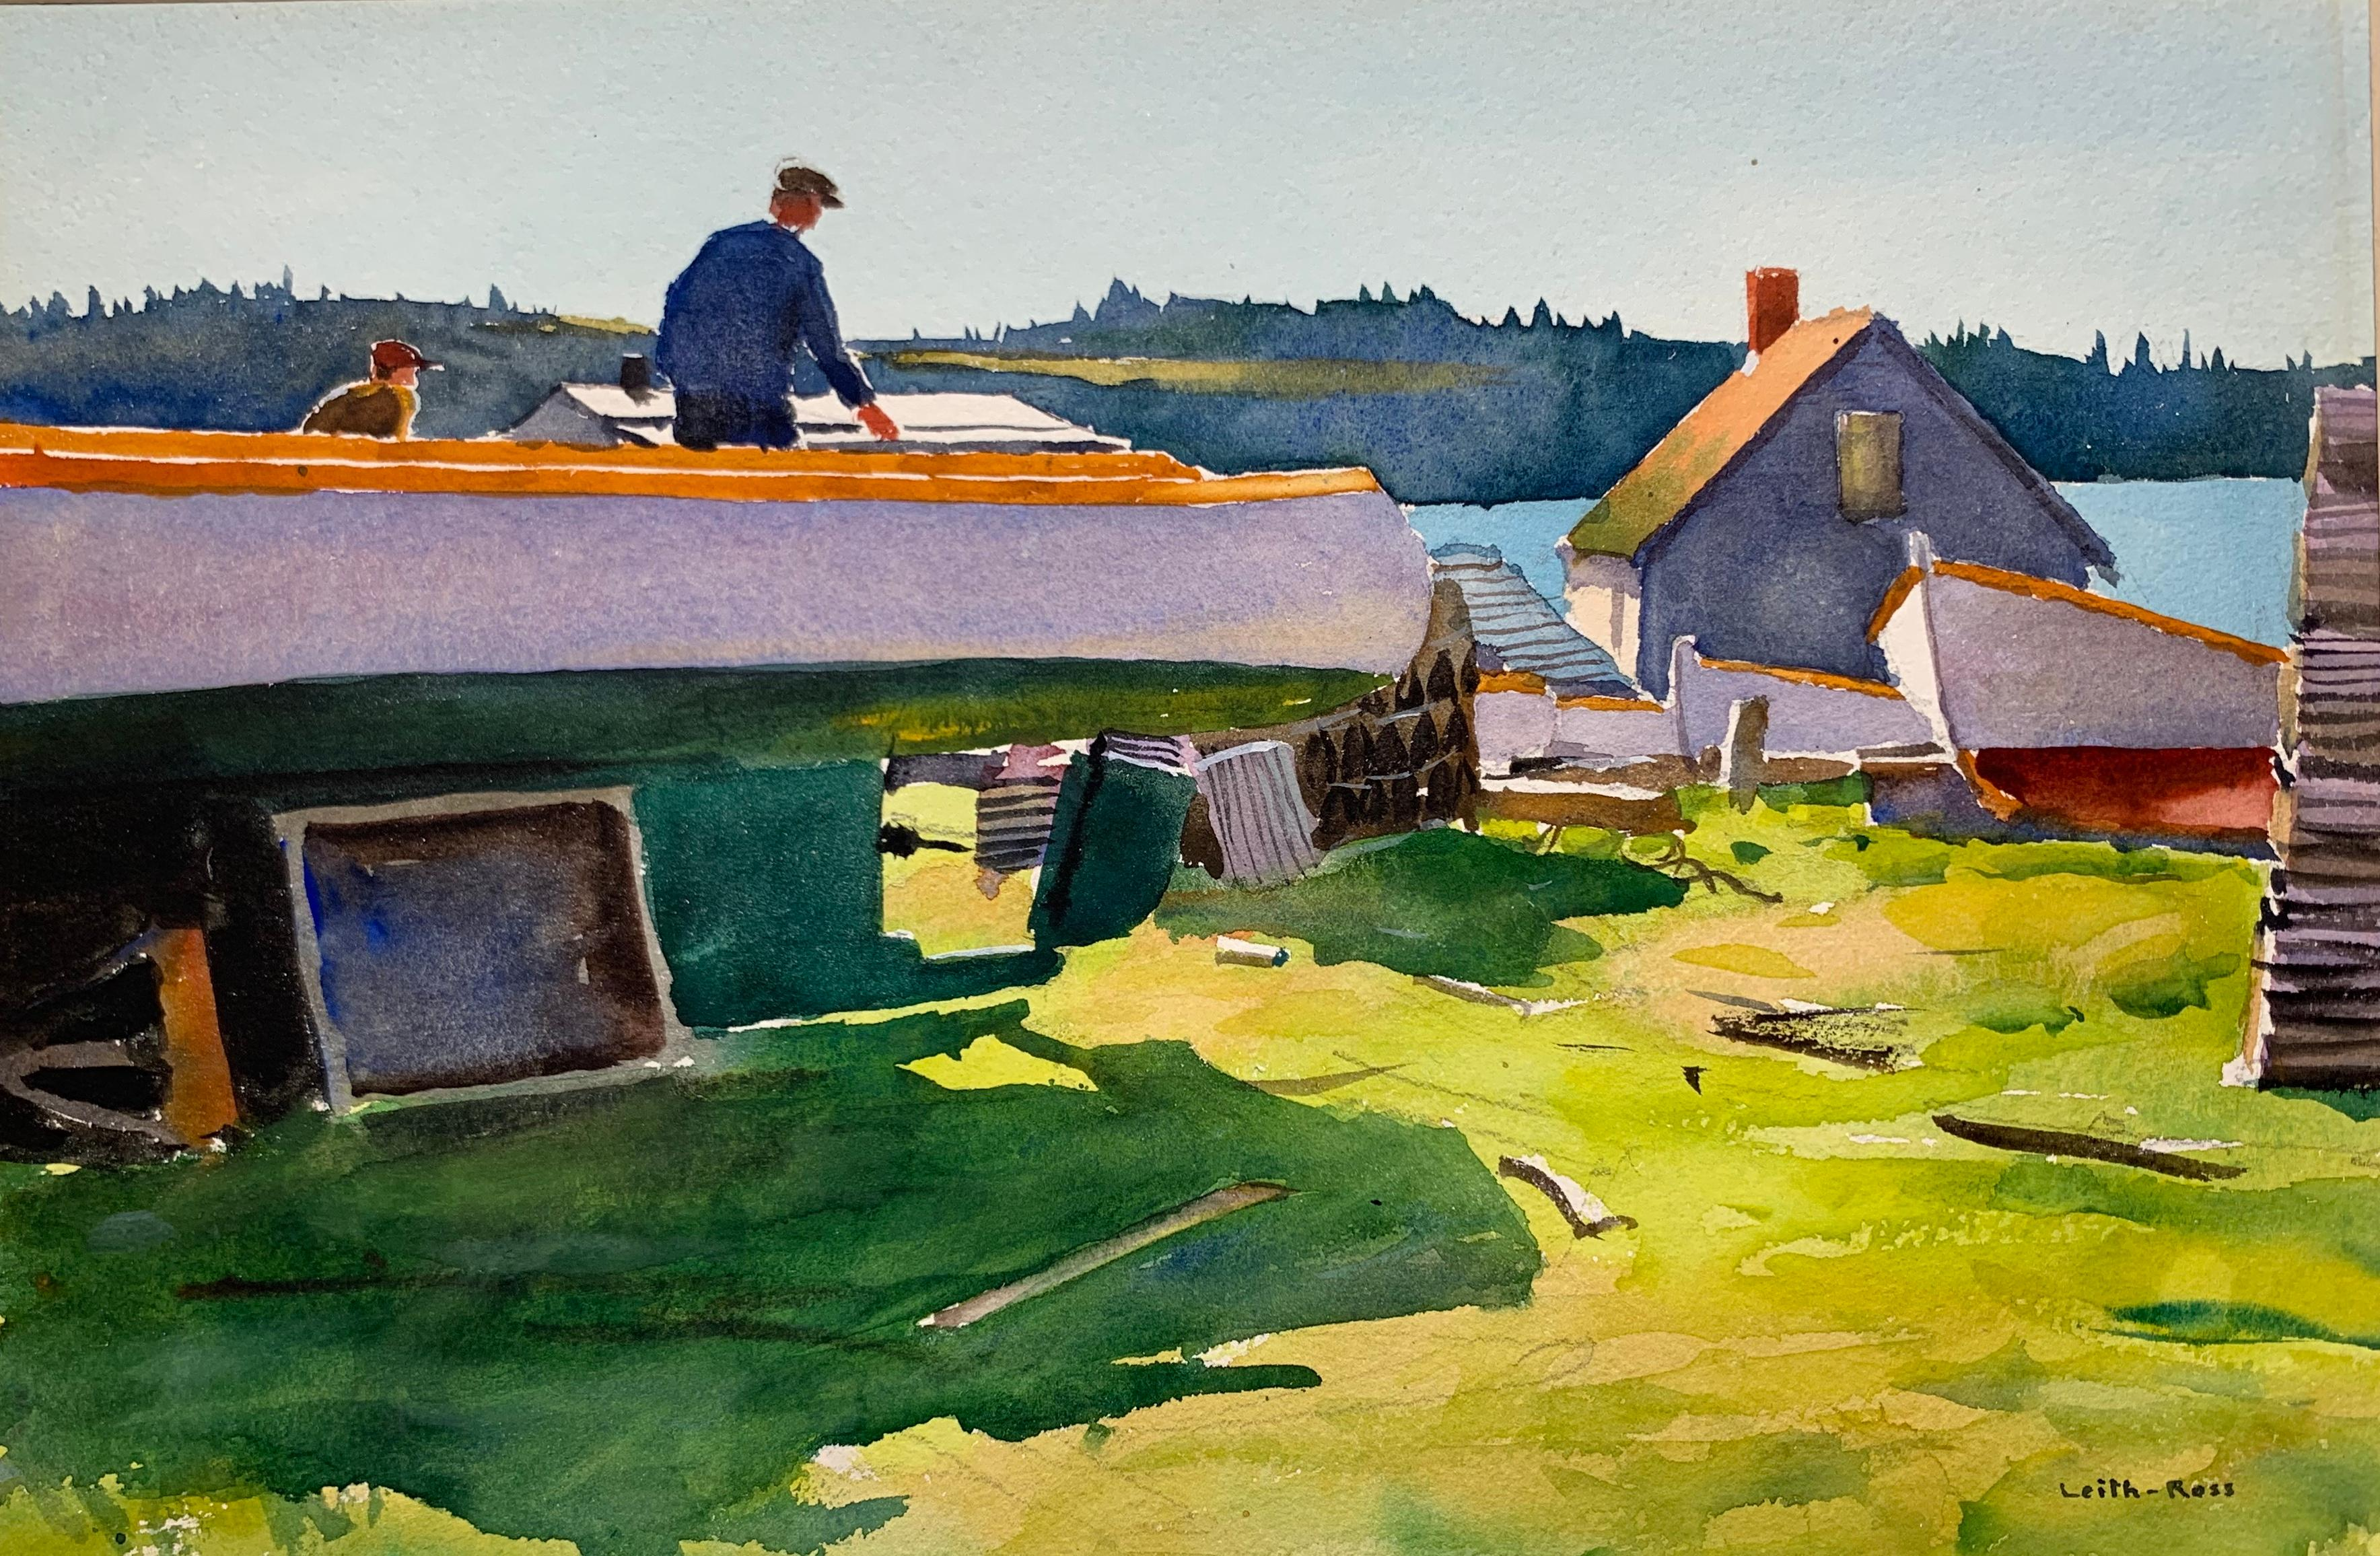 Boat Worker (New England landscape, New Hope Impressionist)